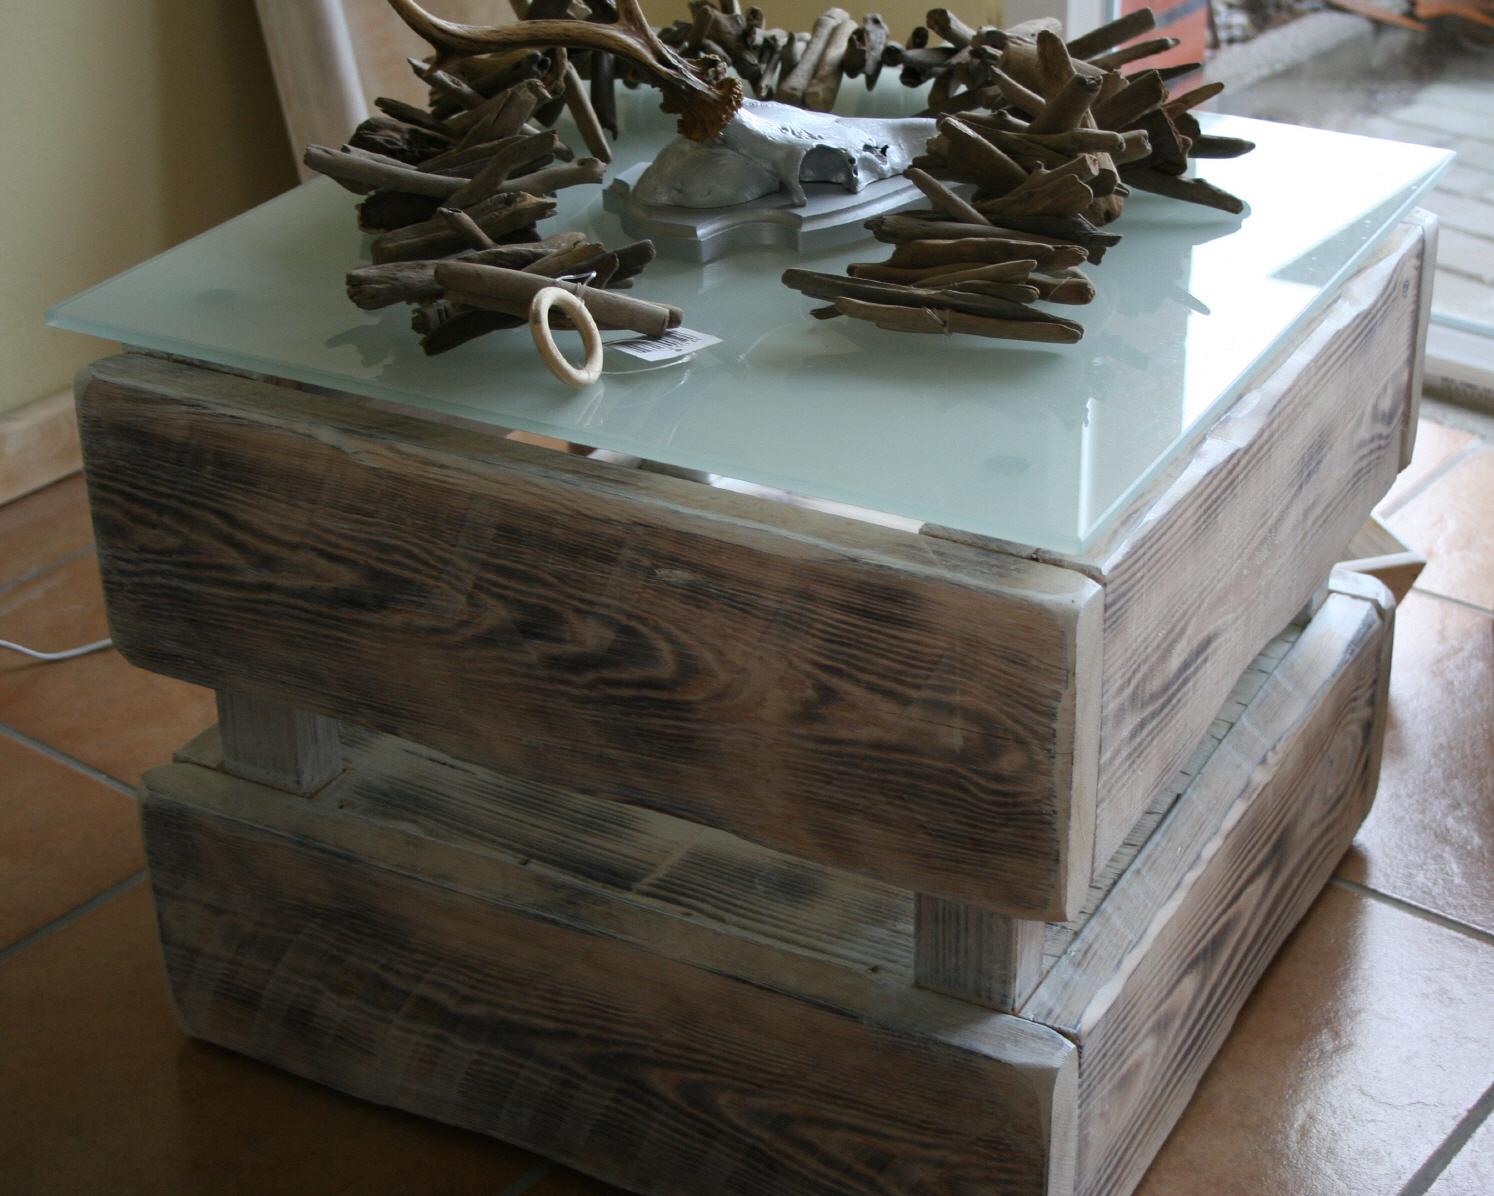 holz und metallkunst in st peter ording handmade vom fachmann. Black Bedroom Furniture Sets. Home Design Ideas